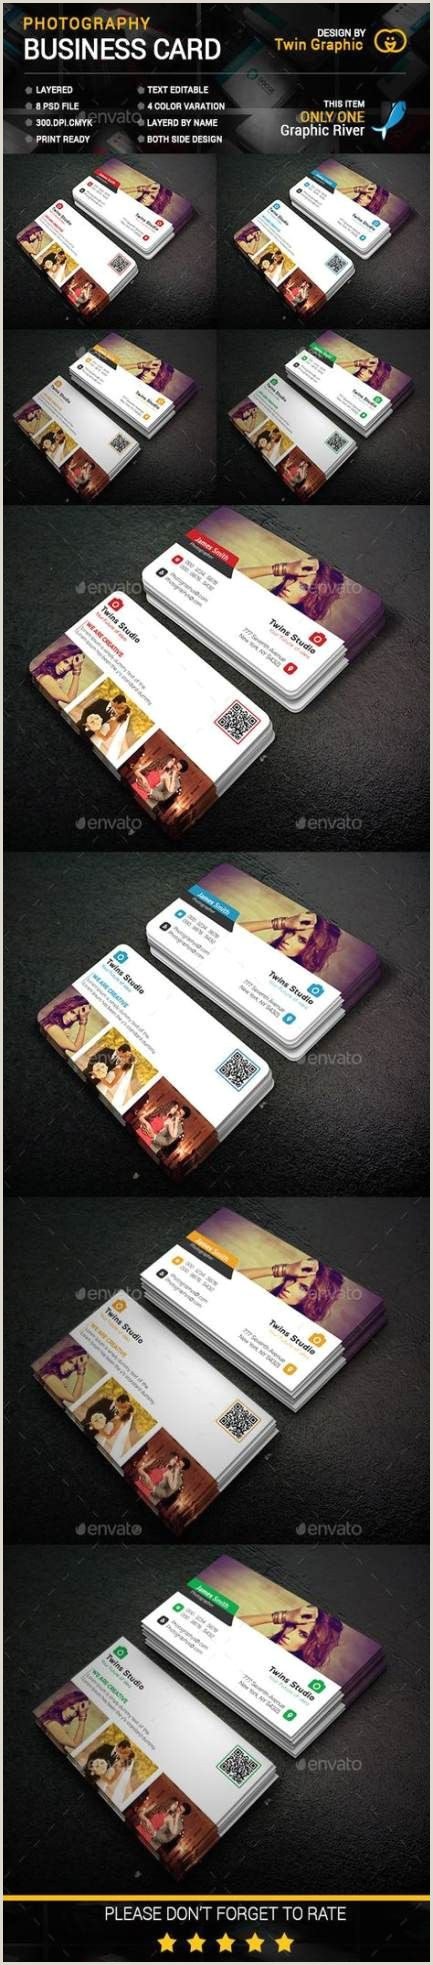 Elegant Names For Photography Business Super Photography Business Cards Design Website 38 Ideas